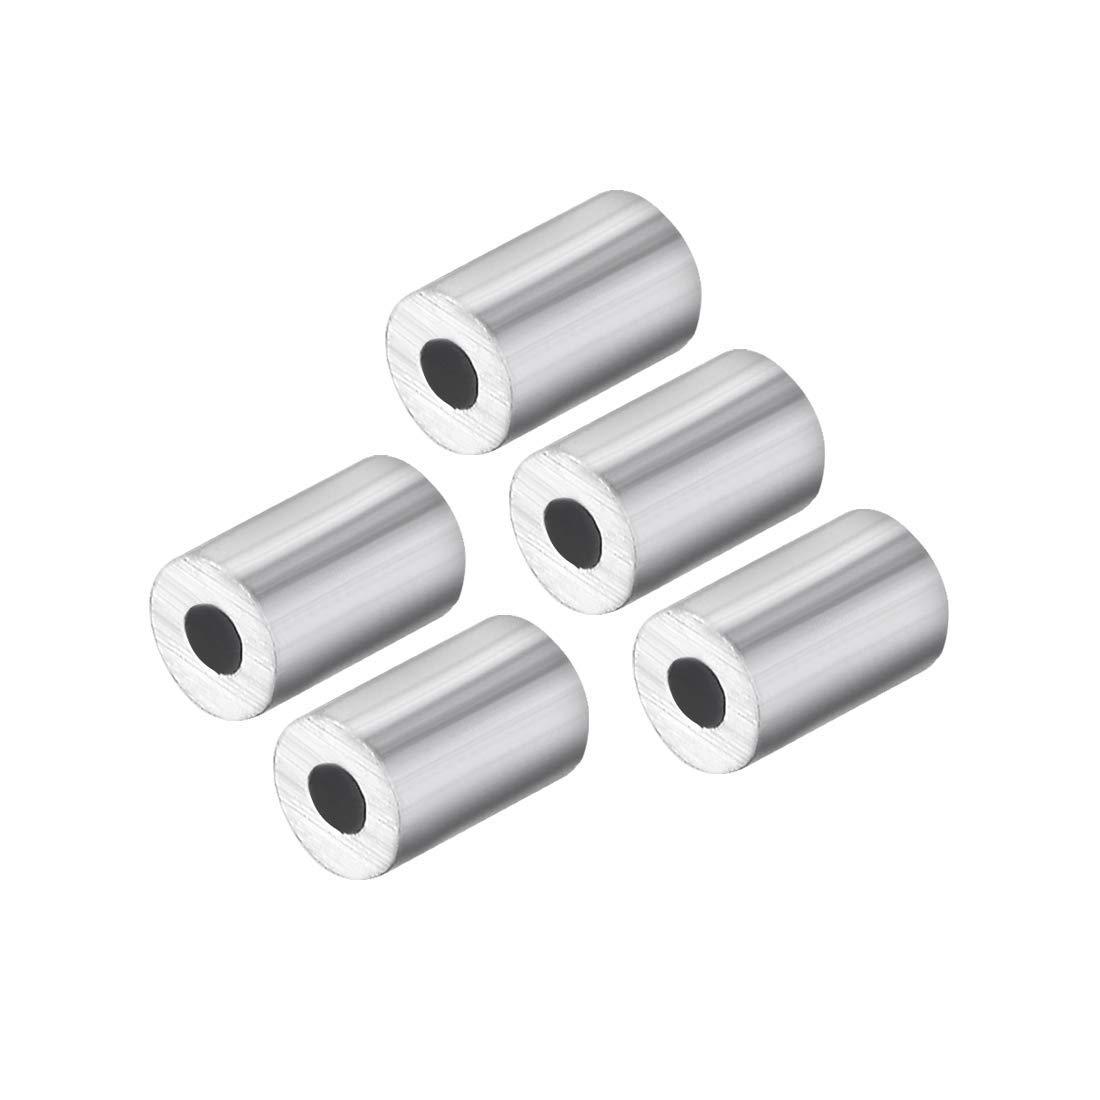 Amazon.com: ZCHXD M1 Aluminum Sleeve Single Tube Crimp 1mm(3 ...